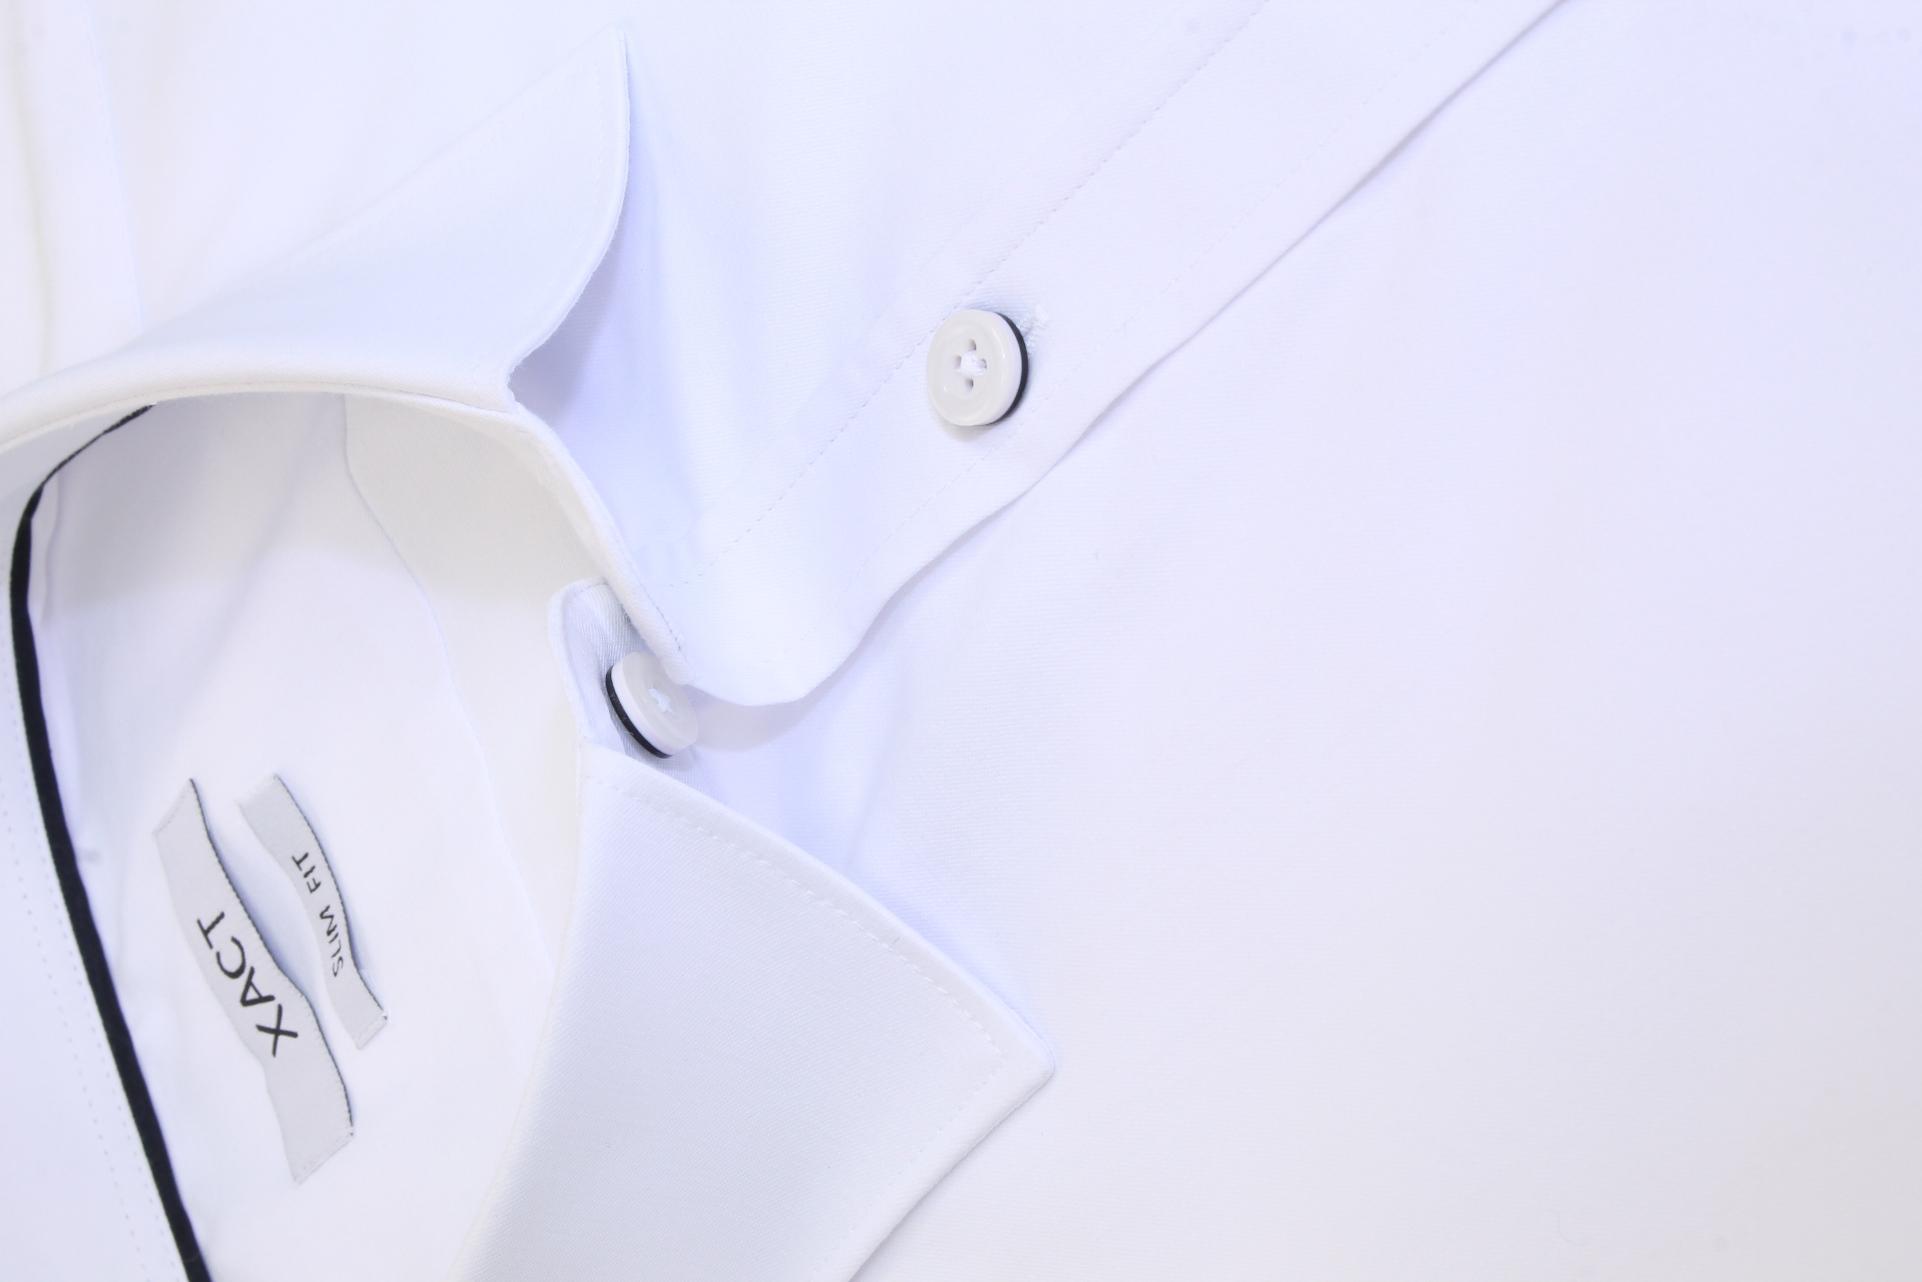 Xact-Mens-Long-Sleeved-Poplin-Stretch-Shirt-Slim-Fit miniatuur 15